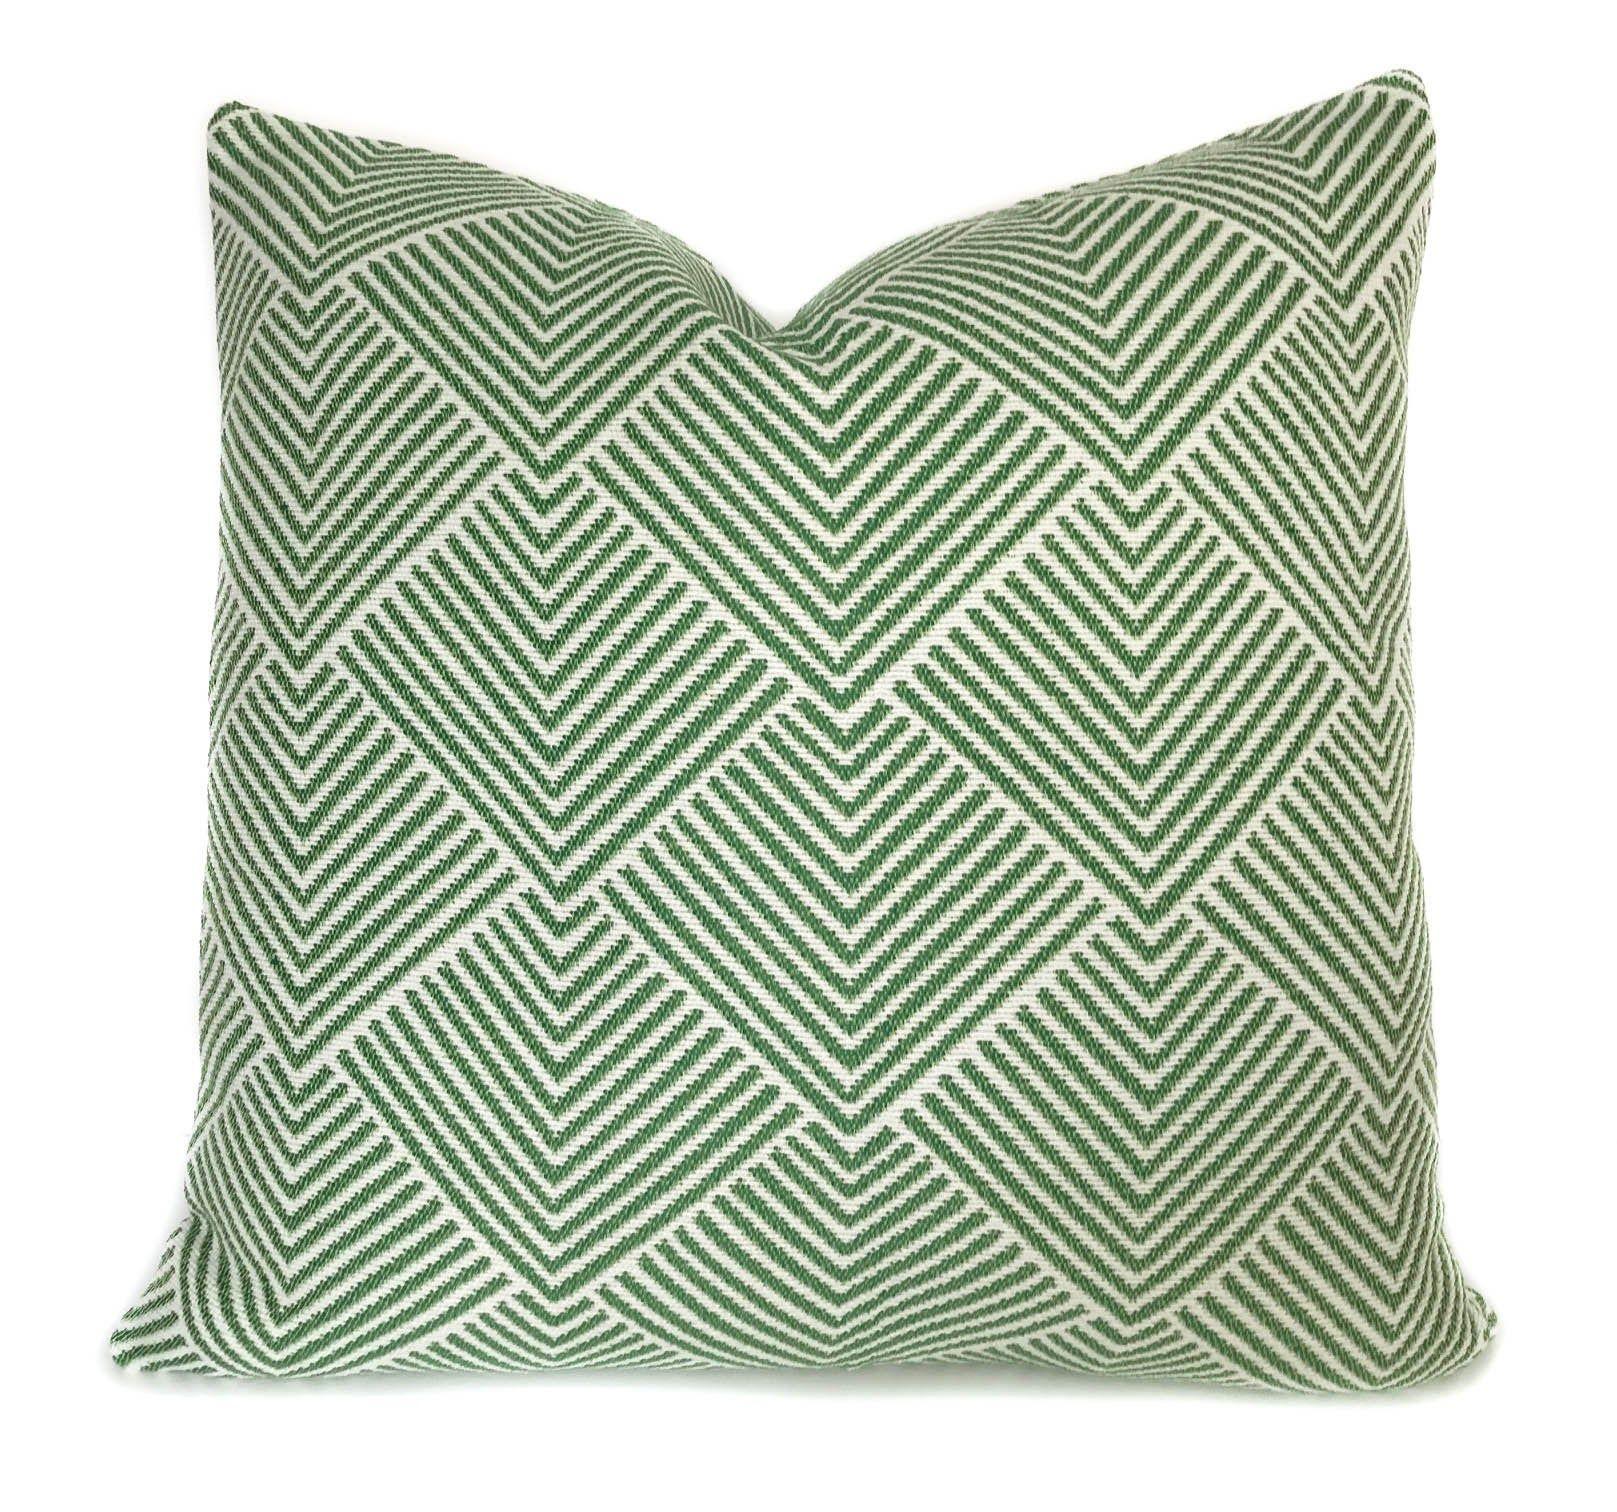 Green White Outdoor Decorative Throw Pillow Cover With Zipper Etsy Outdoor Pillow Covers Decorative Throw Pillow Covers Pillows